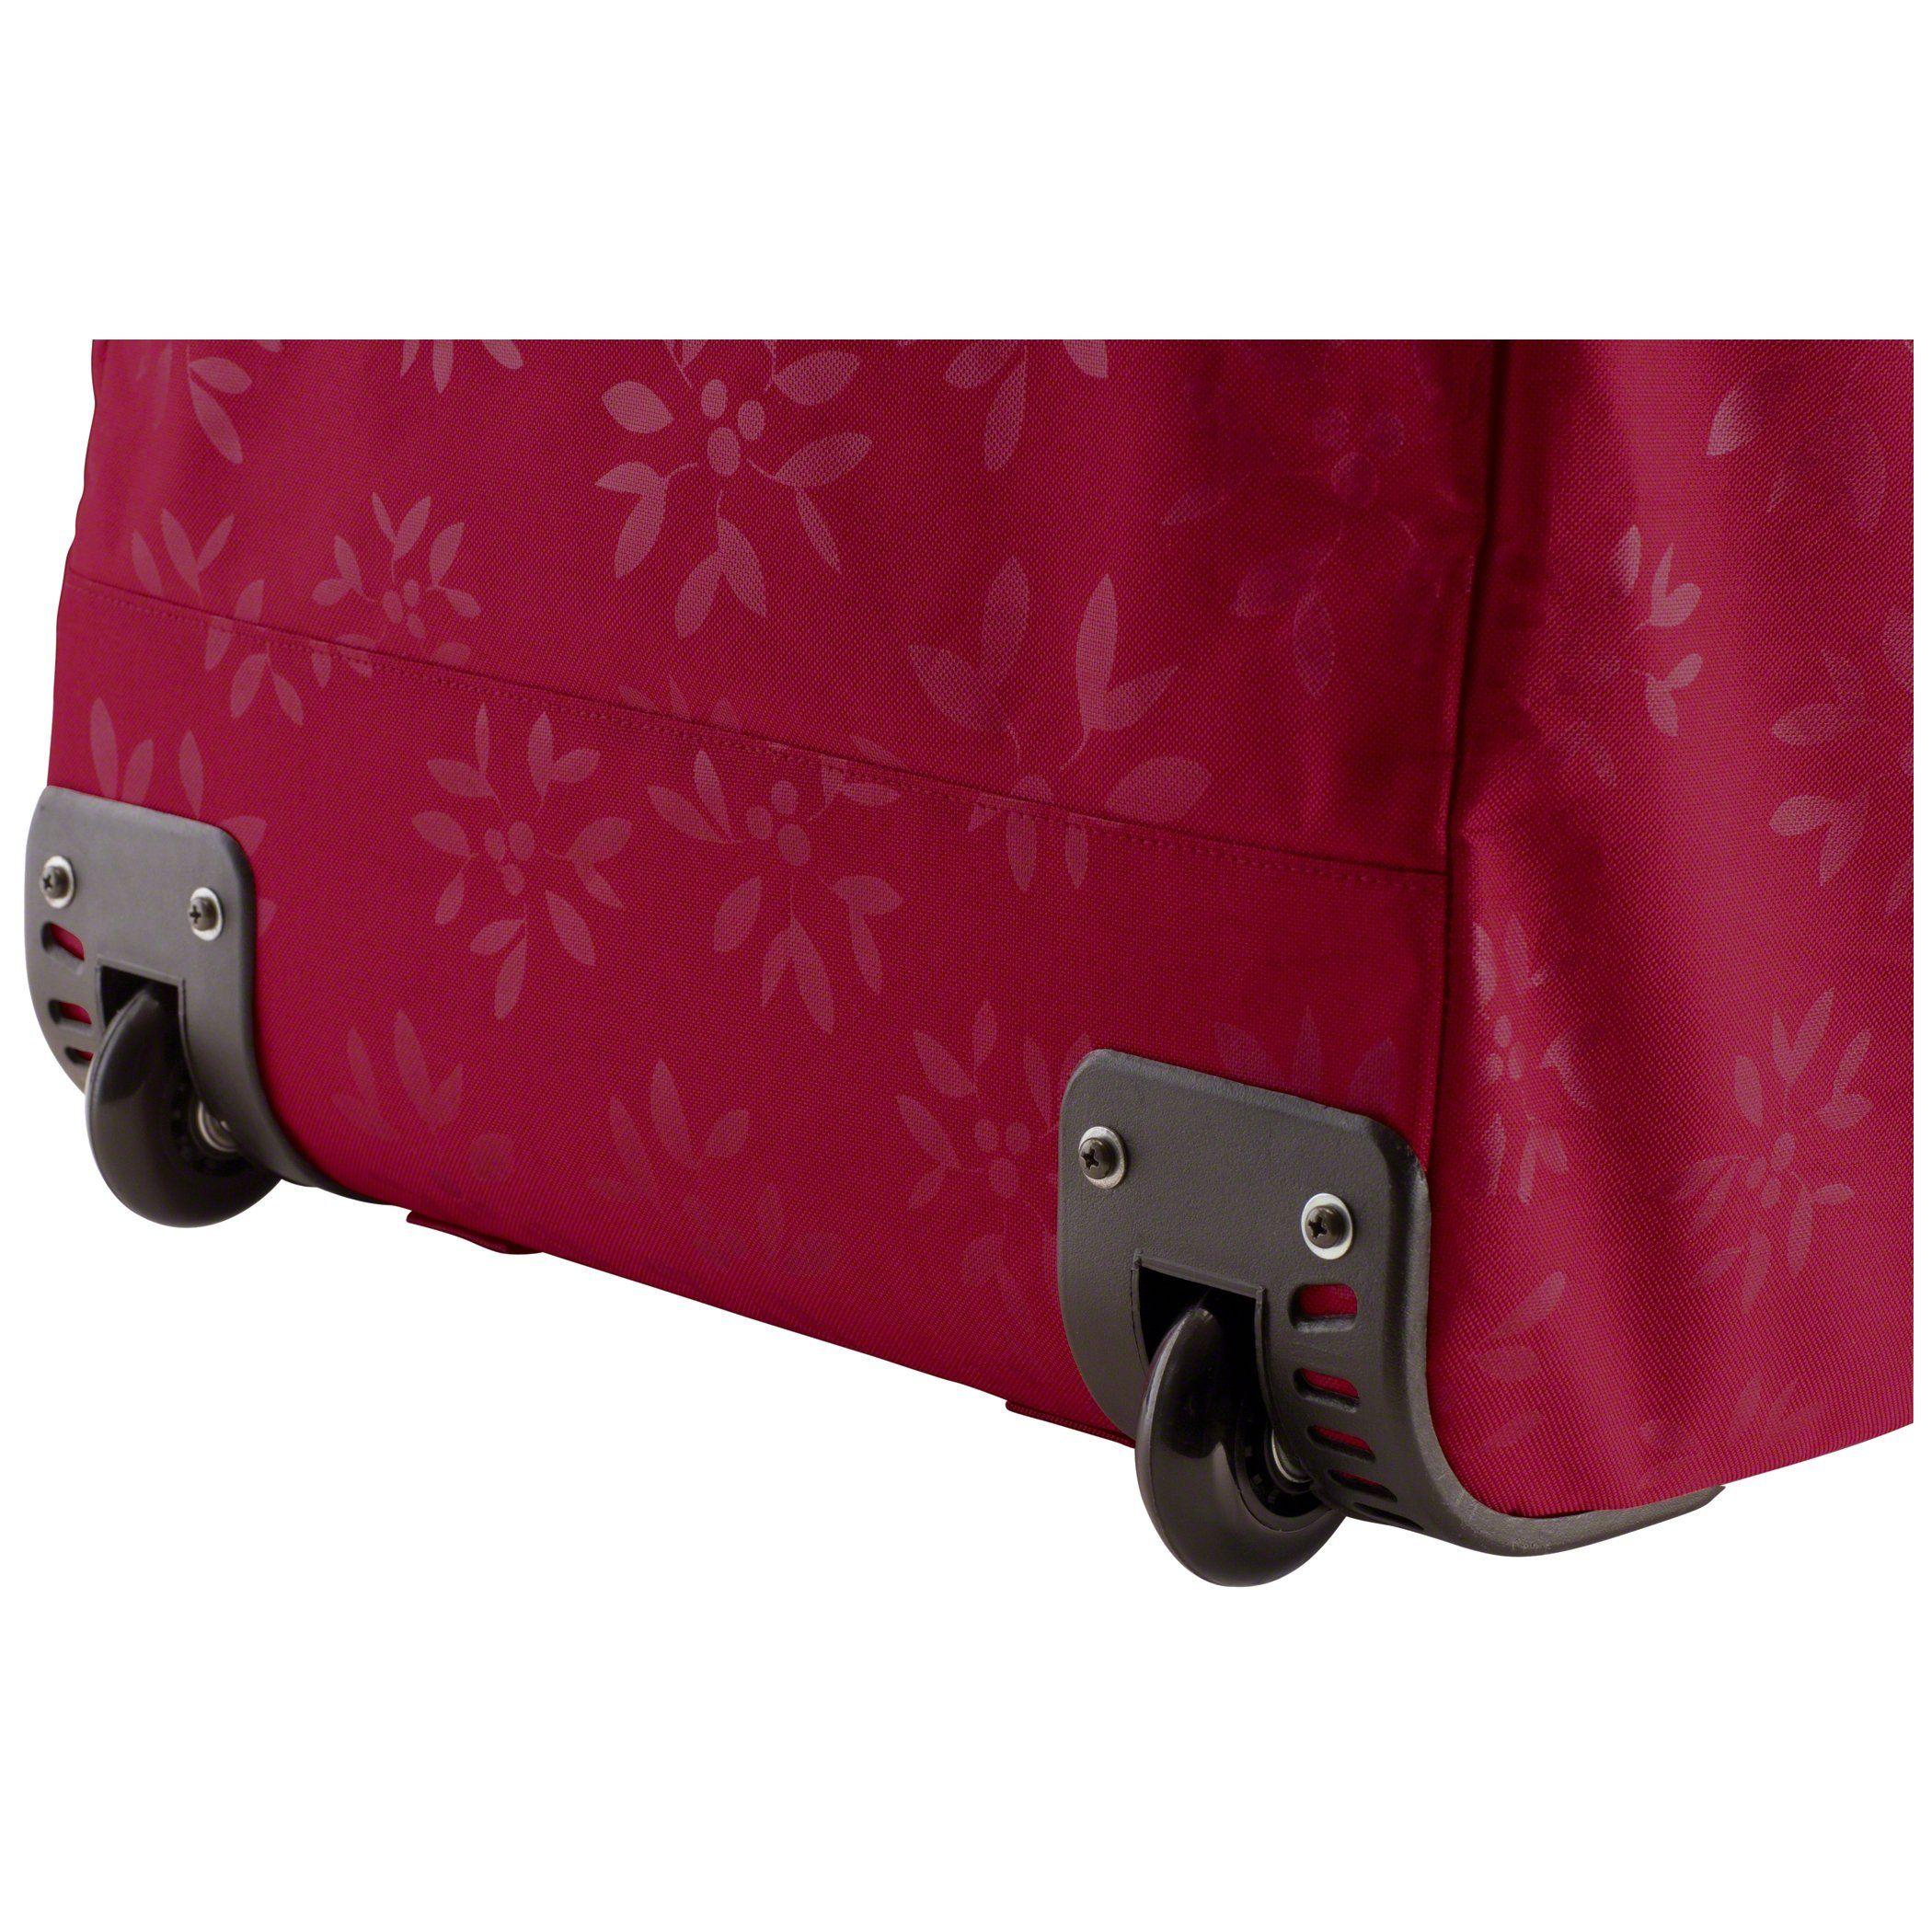 Top 10 Best Christmas Tree Storage Bags In 2020 Reviews Tree Storage Bag Christmas Tree Storage Bag Cool Christmas Trees